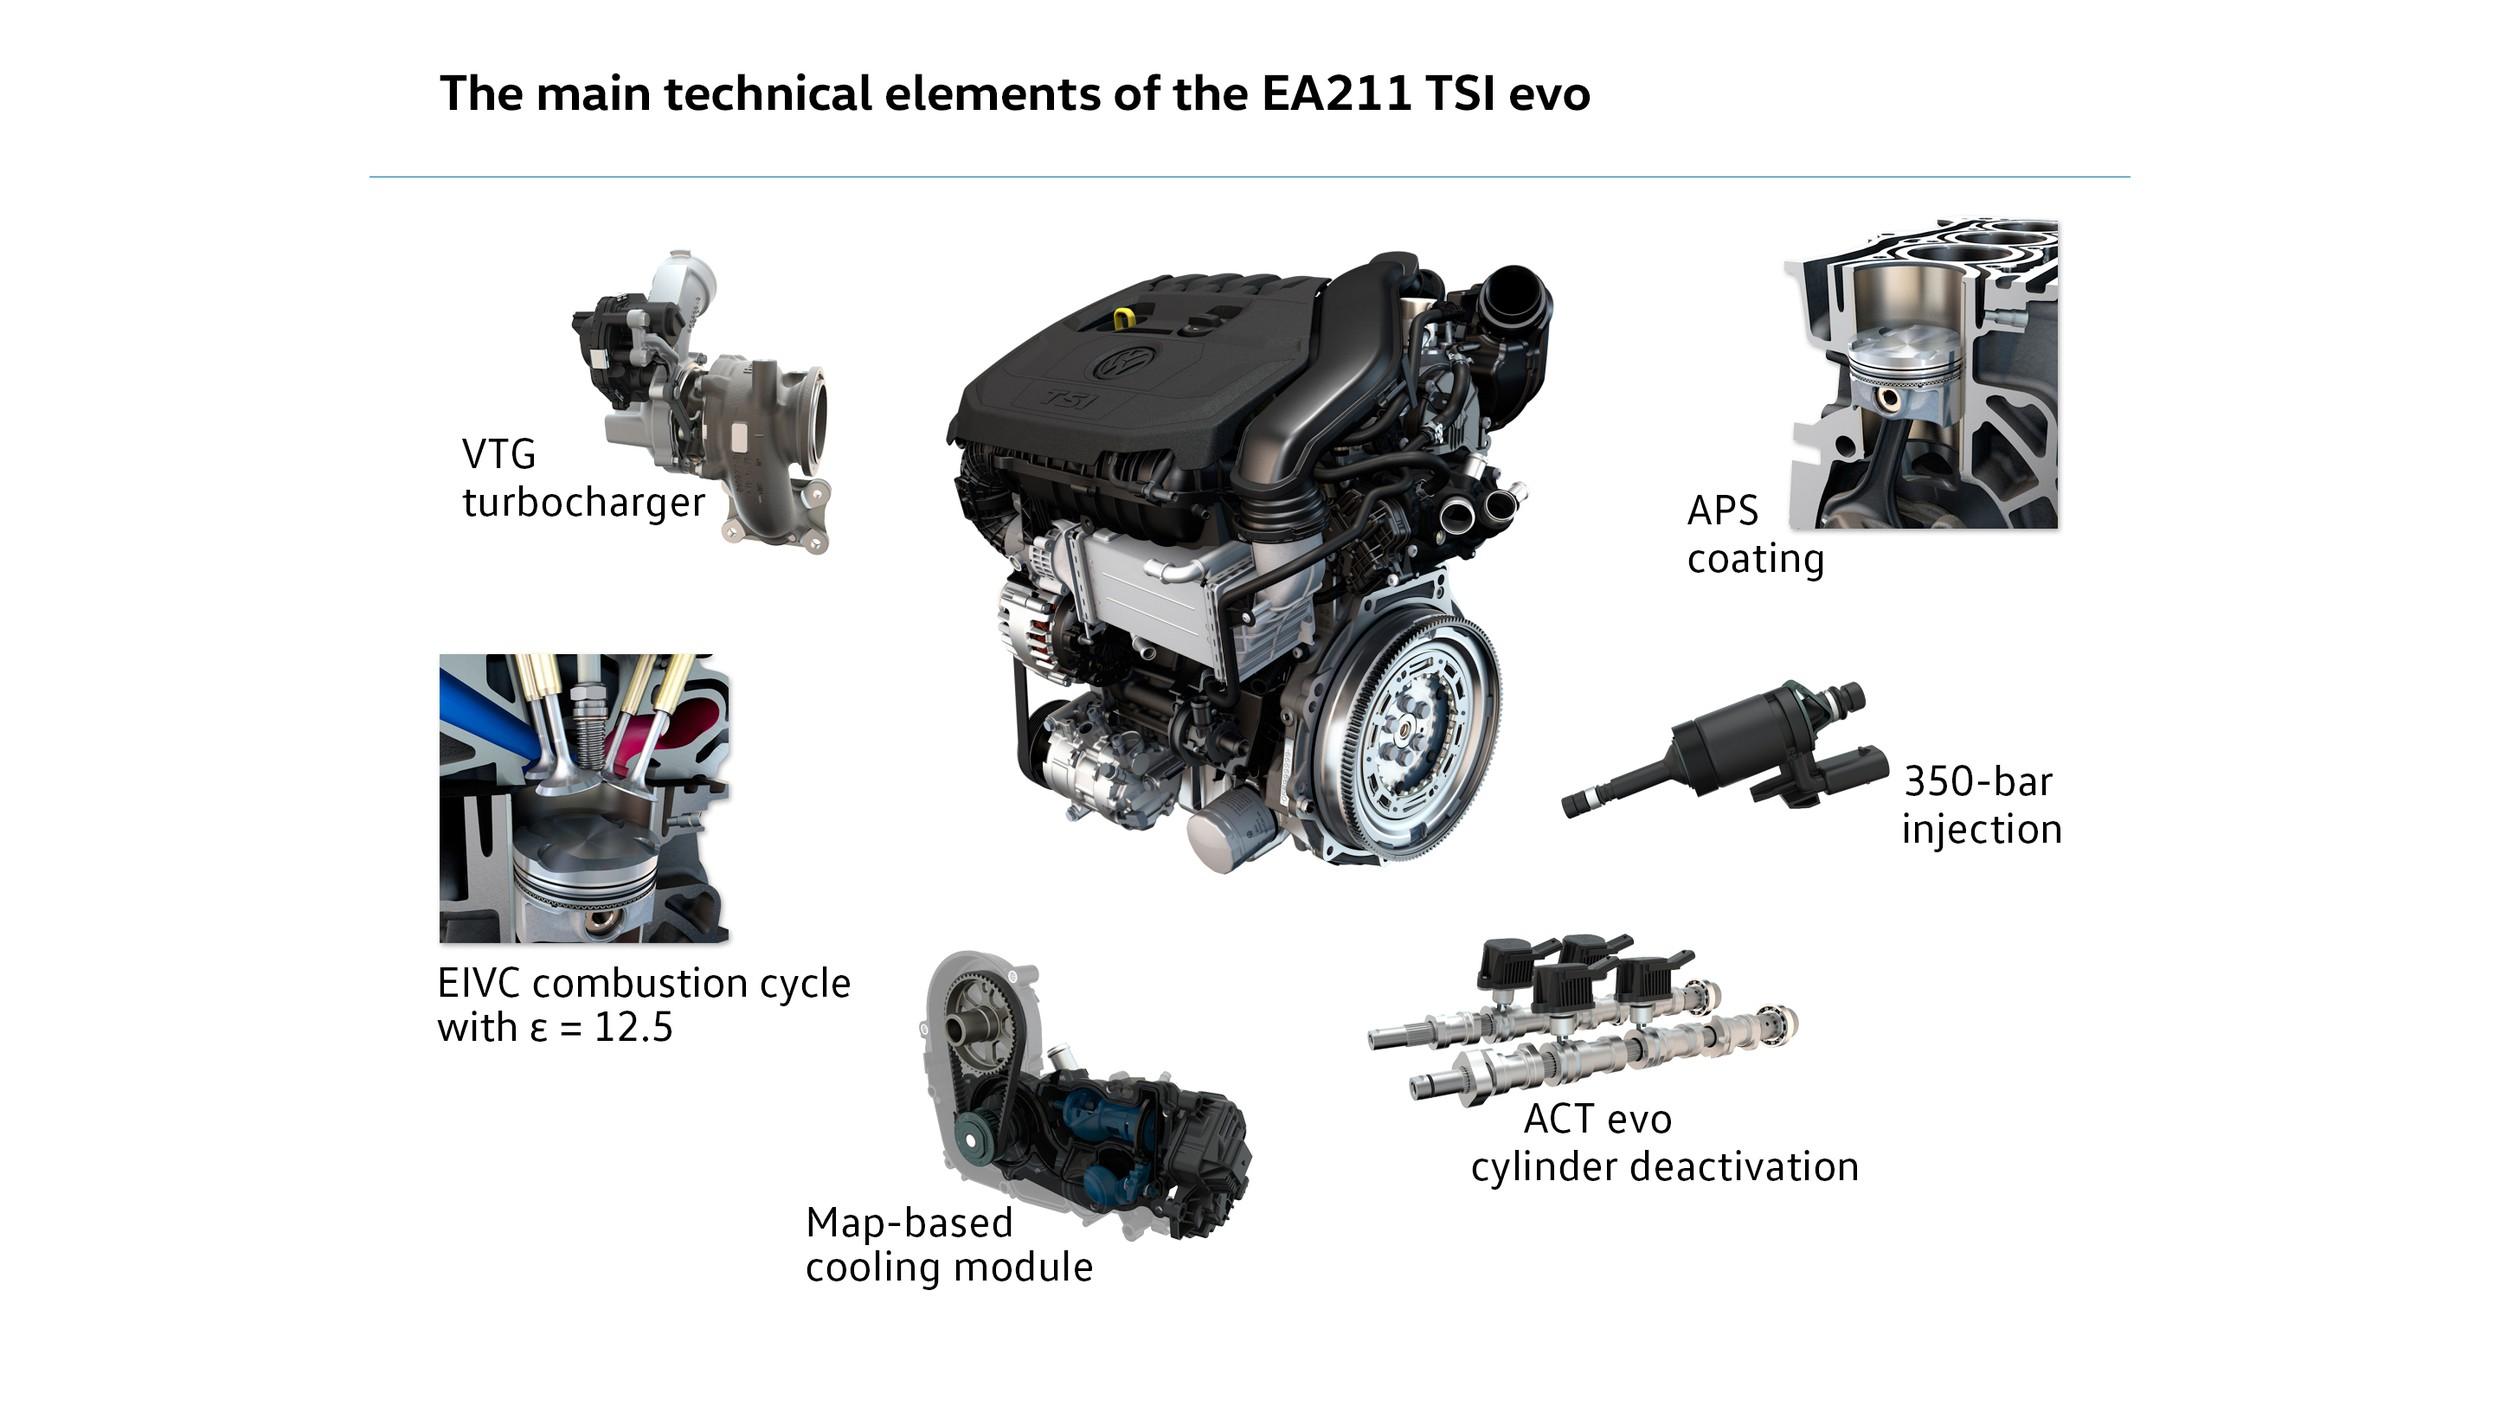 Volkswagen Announces New 1 5 Liter Tsi Evo Engine With Impressive Specs